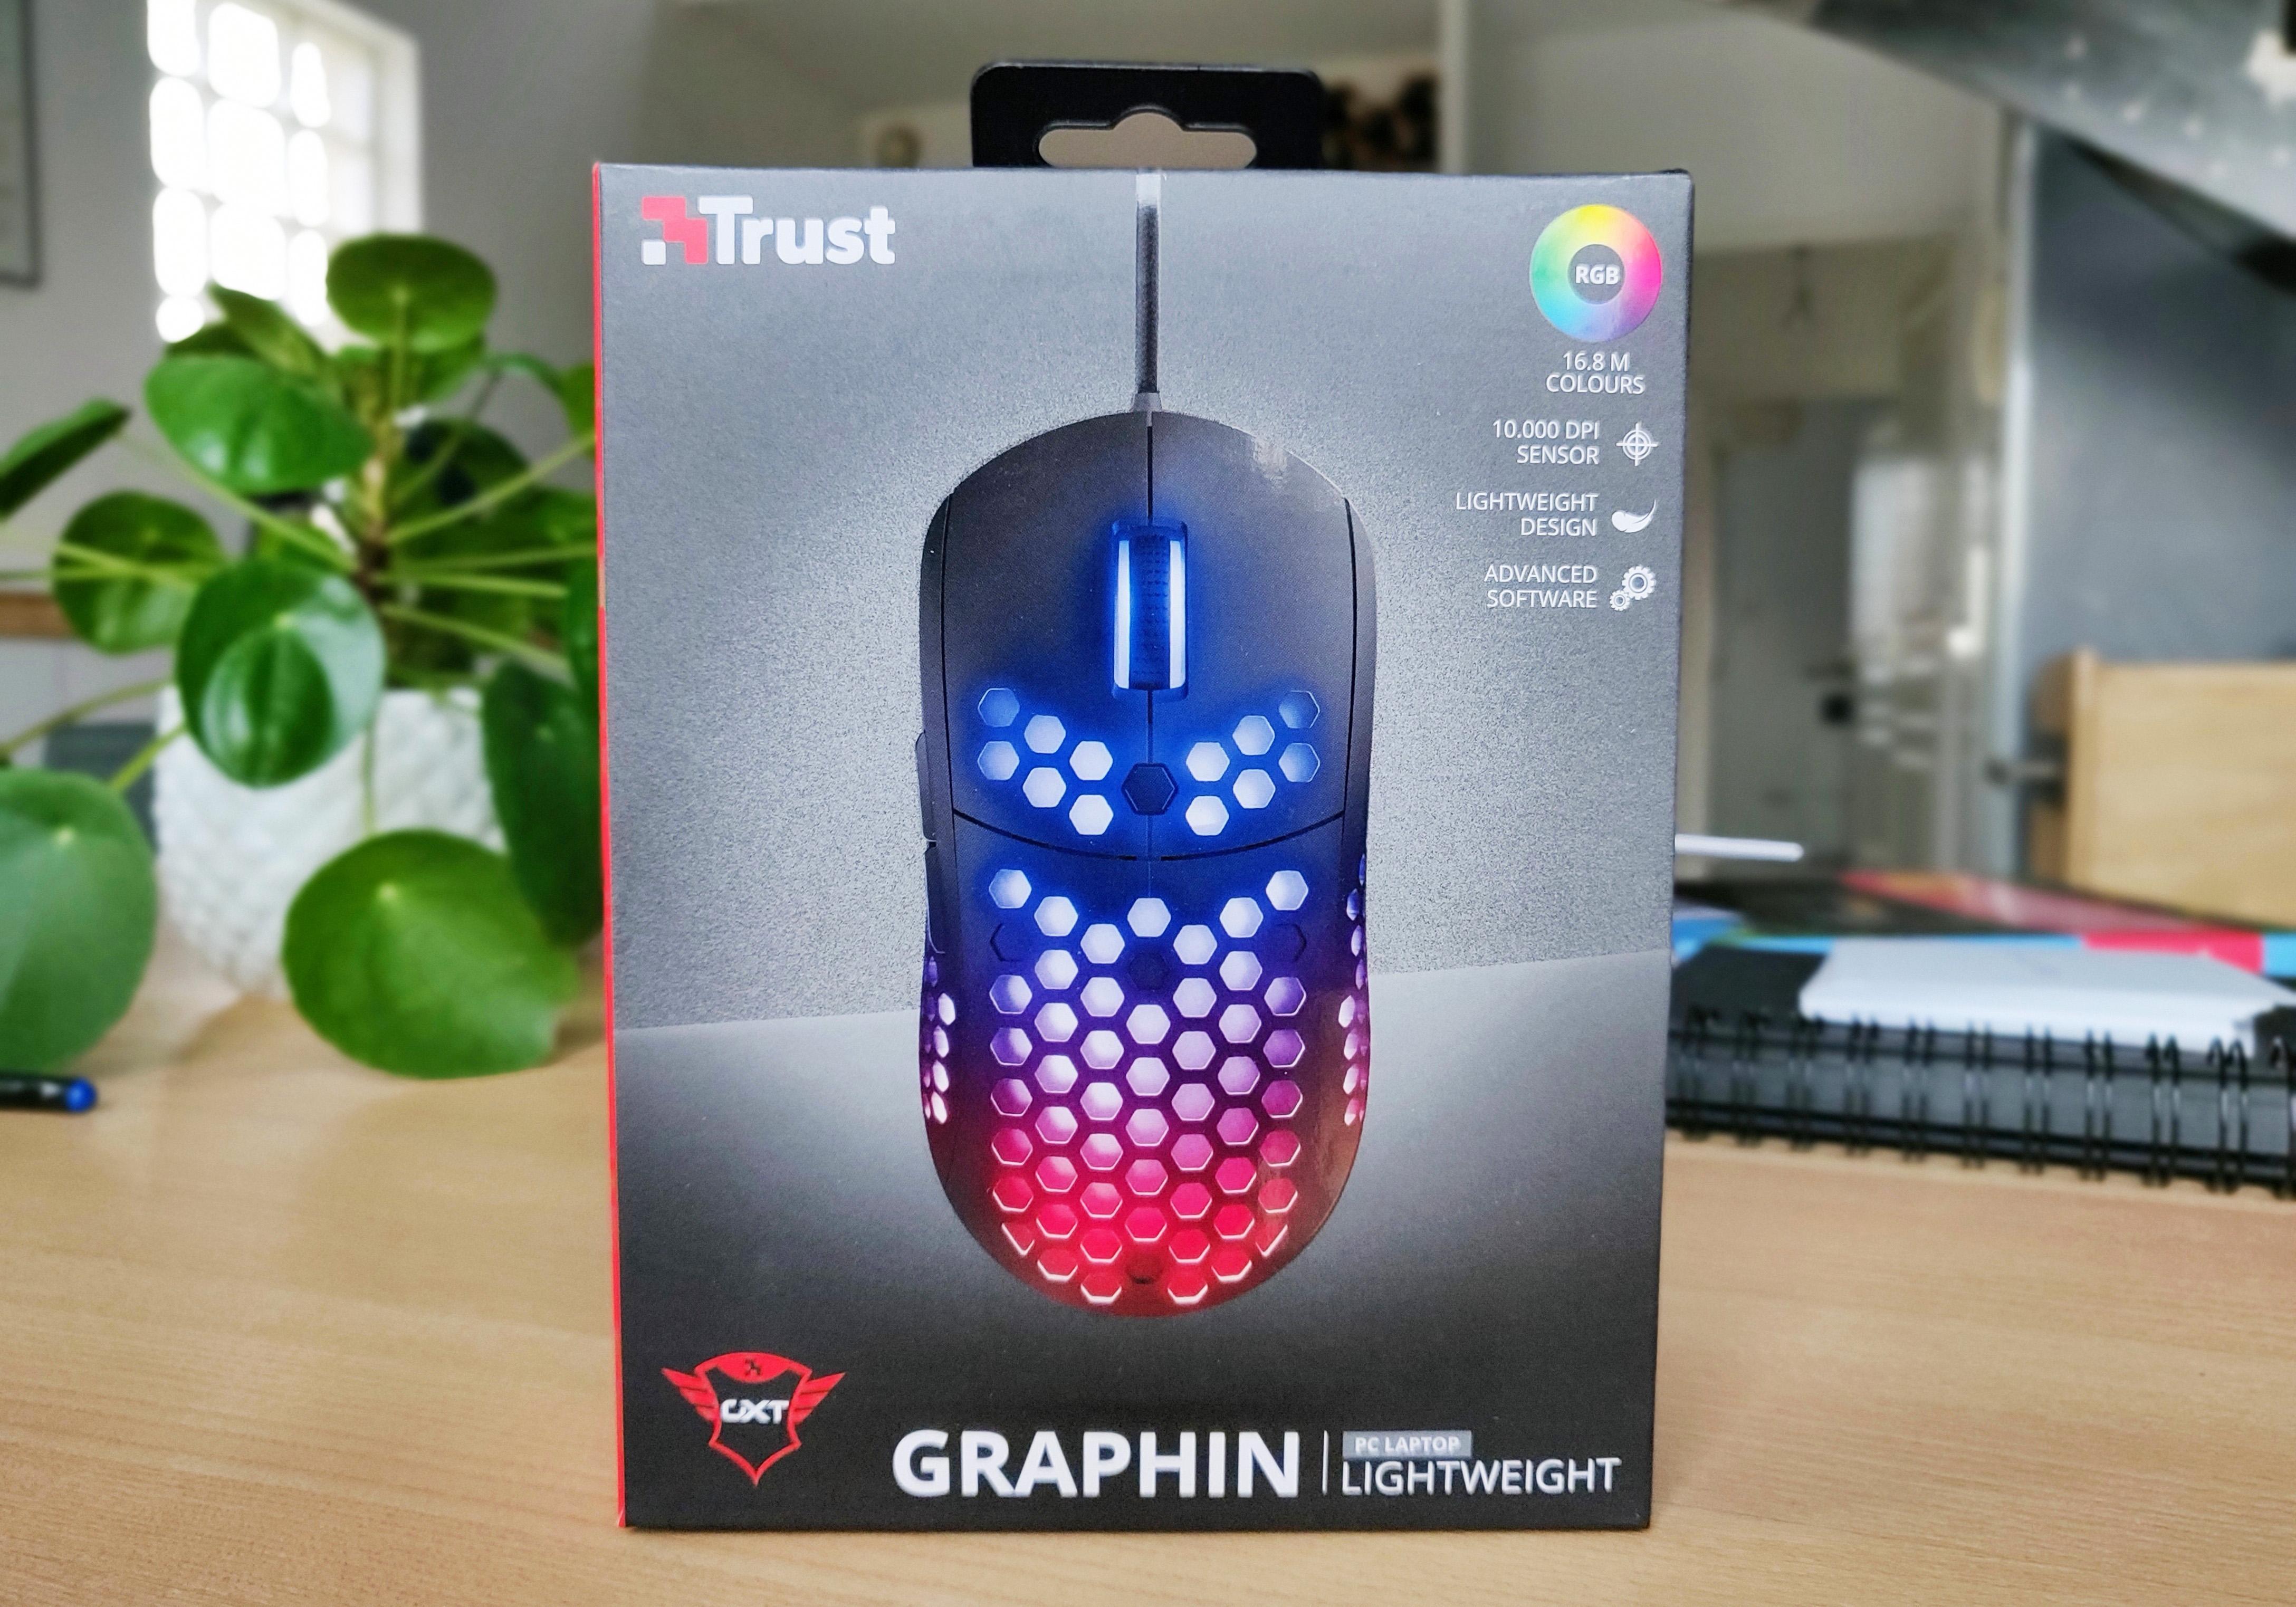 Trust Gxt 960 Graphin Test Mouse Souris Omgpu.com.jpg